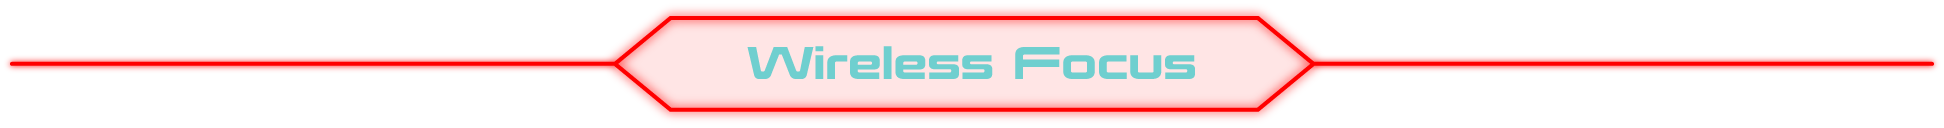 Wireless Focus